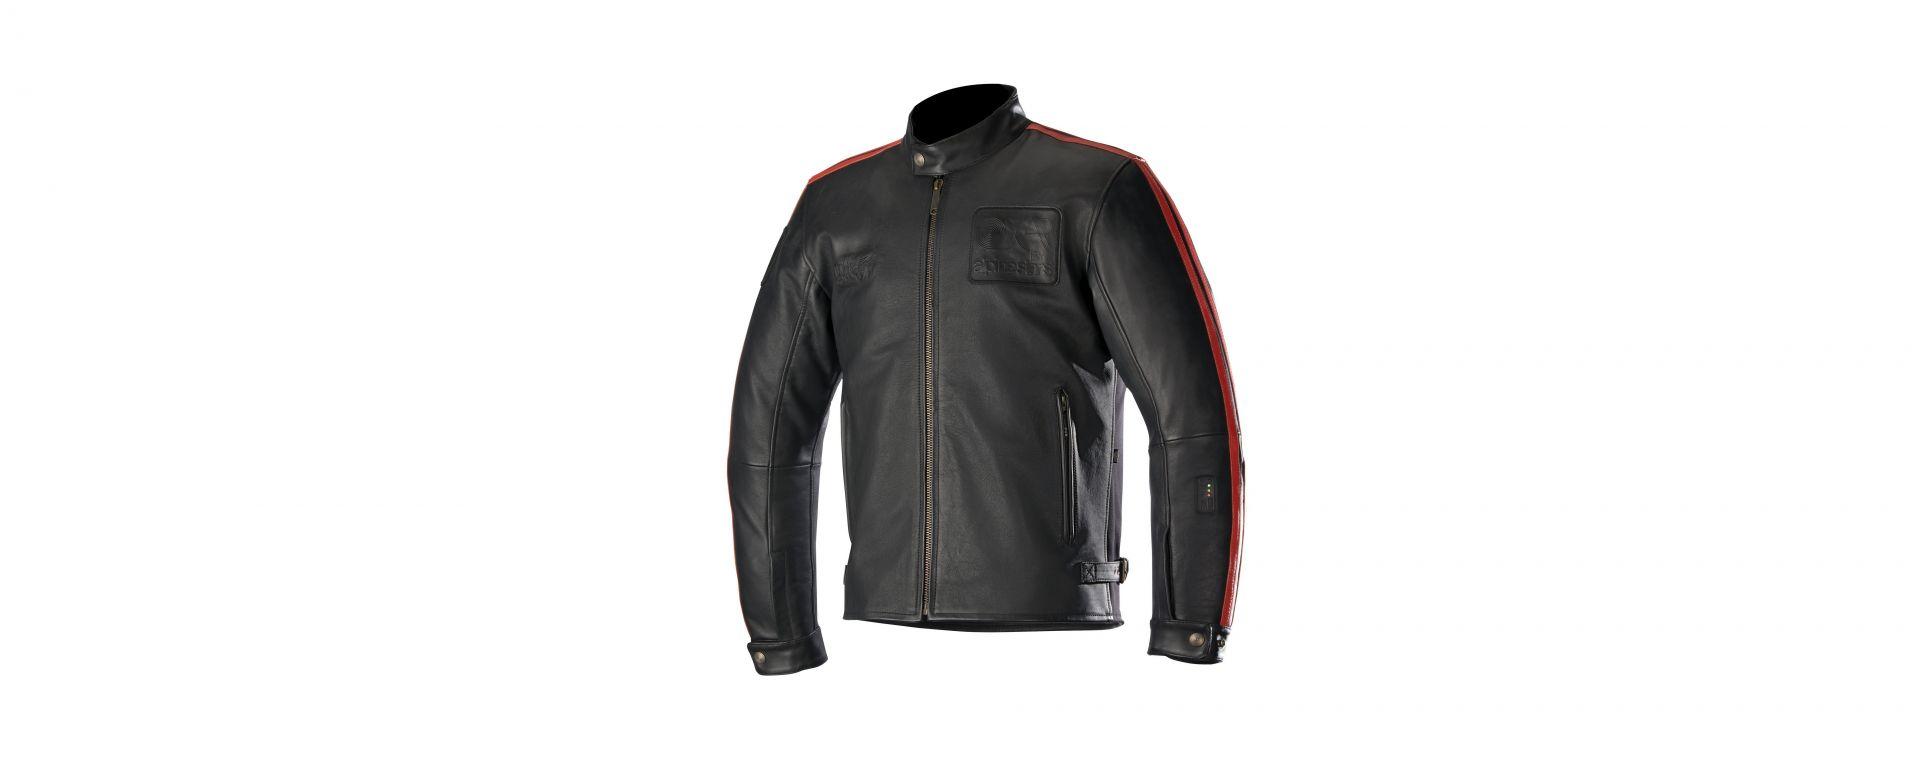 Alpinestars 2018:giacca in pelle Charlie